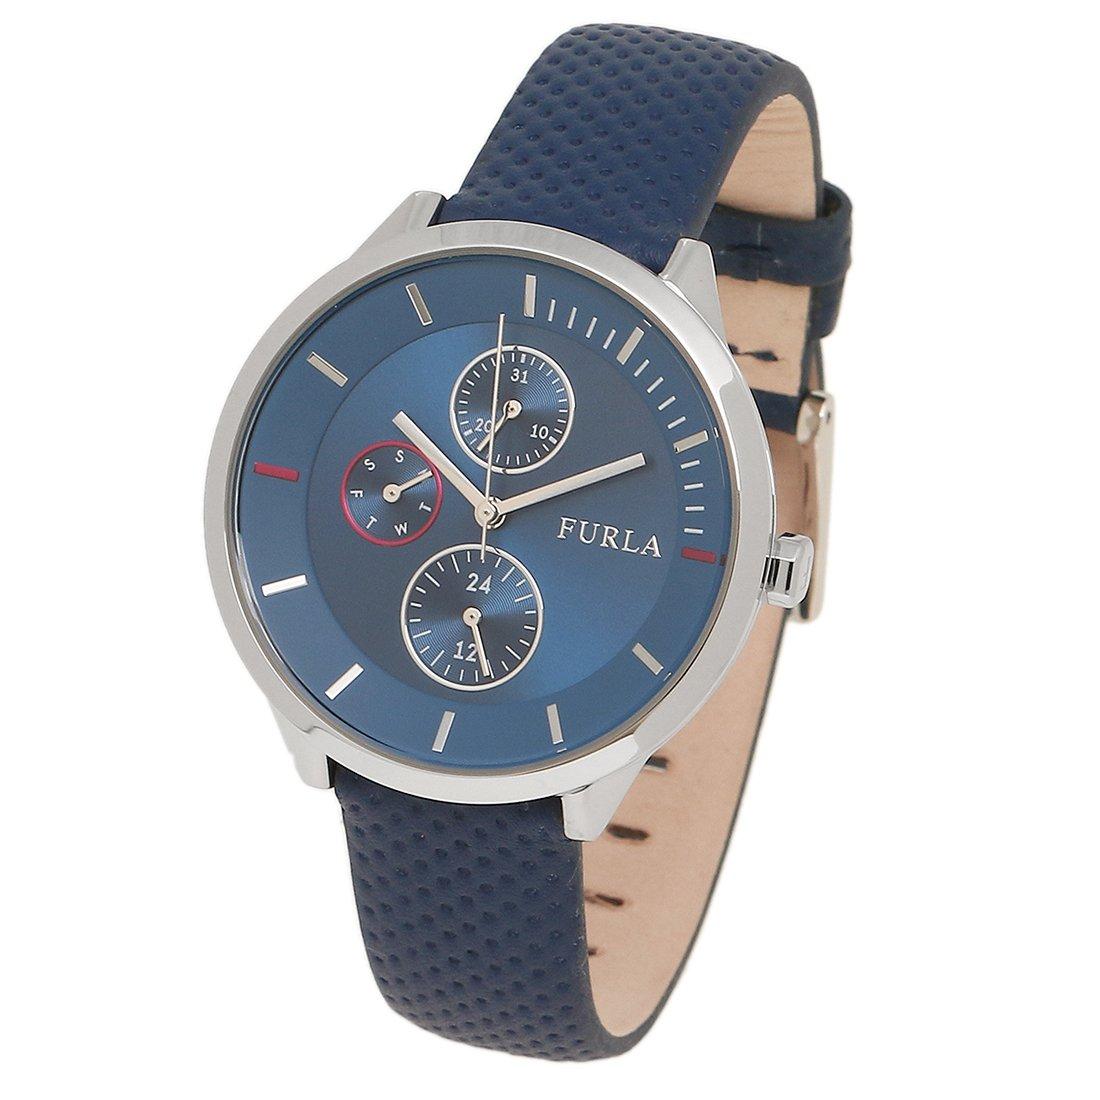 784eb12f05 [フルラ] 腕時計 レディース FURLA R4251102528 899286 W480 WU0 DOL シルバー ブルー [並行輸入